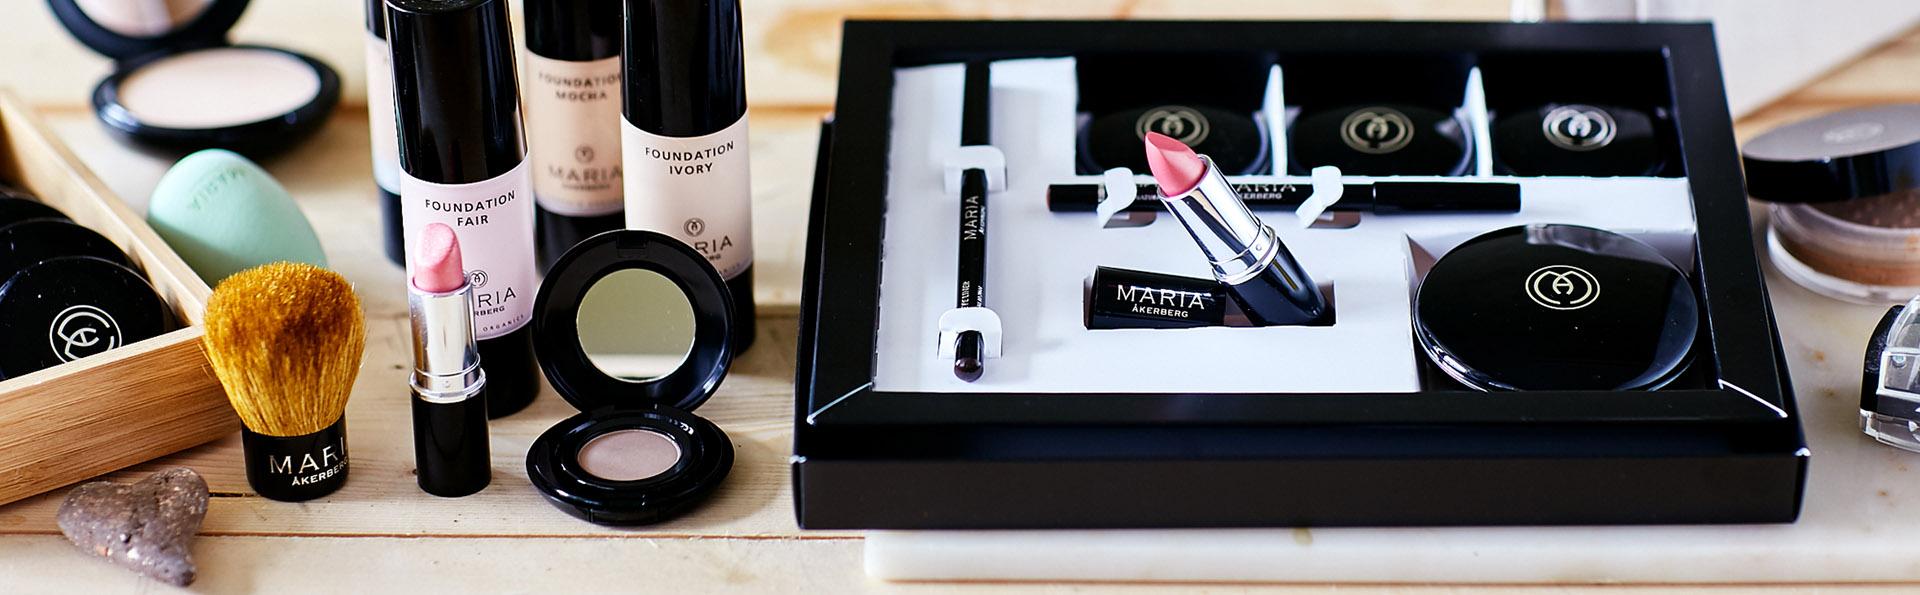 slider-maria-åkerberg-makeup